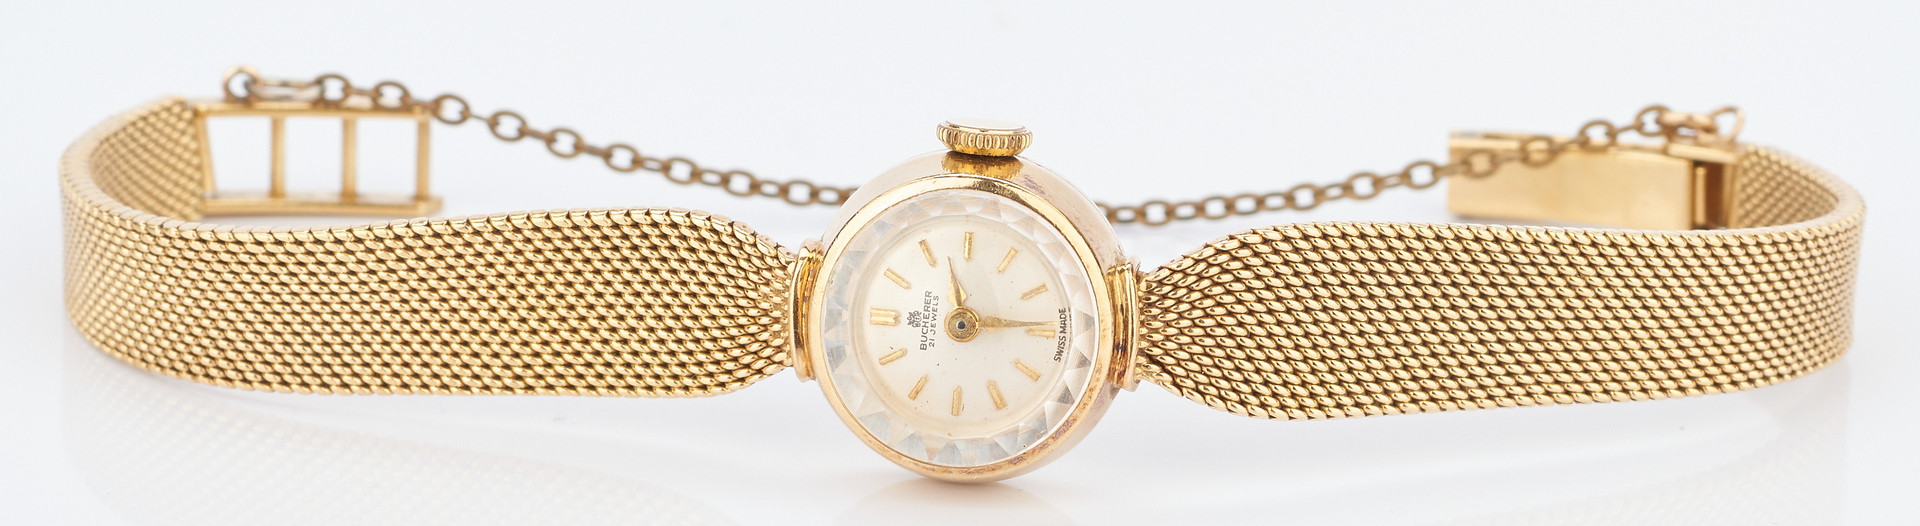 Lot 717: Ladies 18K Bucherer 21 Jewel Wrist Watch